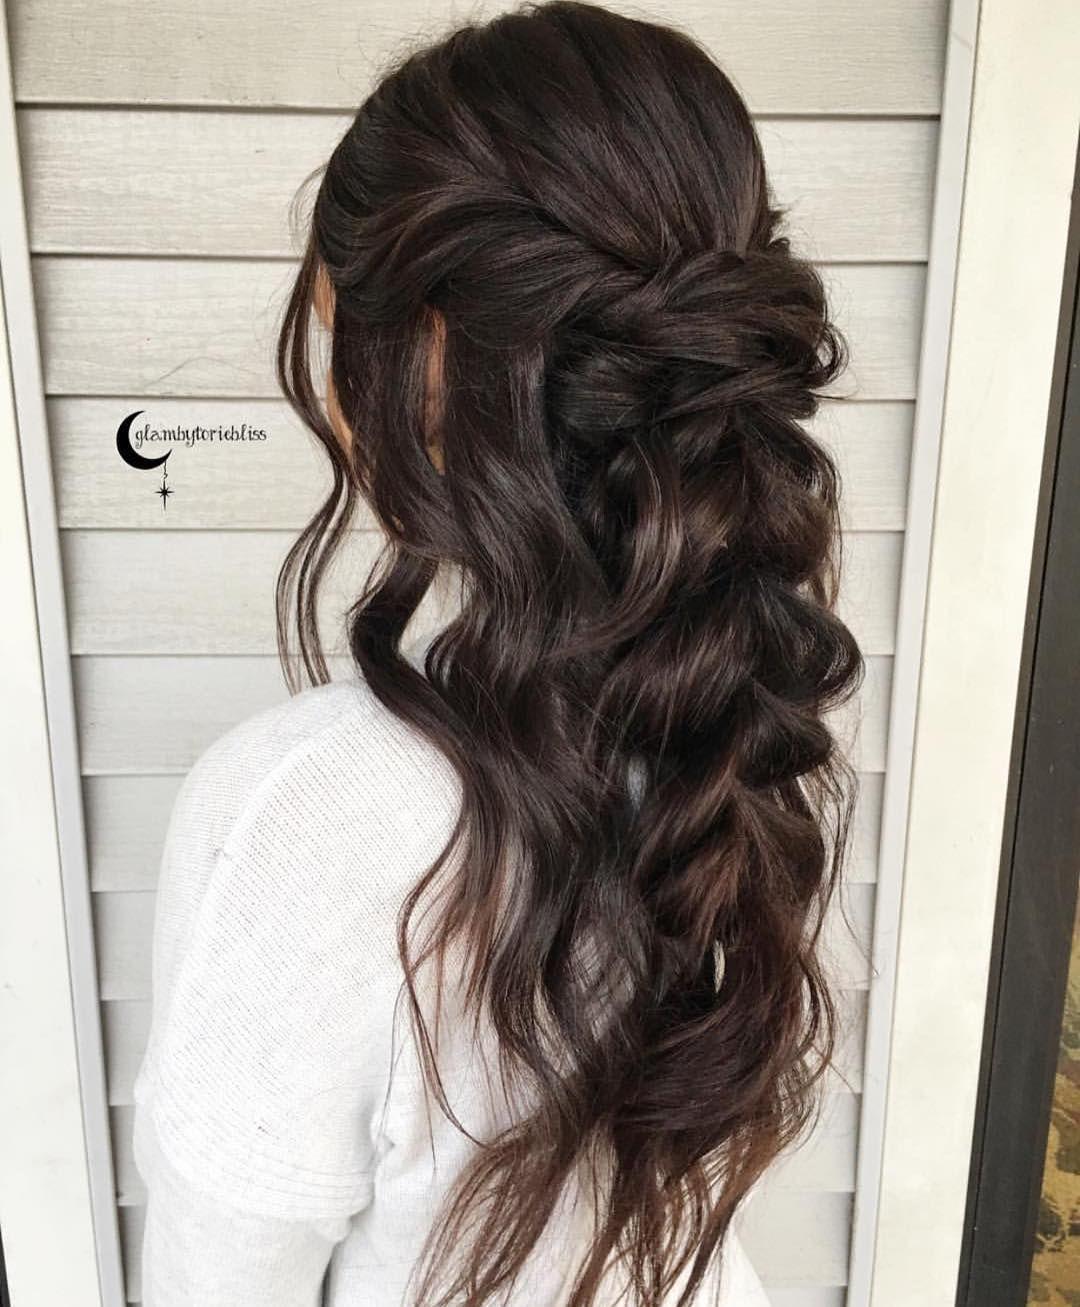 Pin by abby conway on hairrrrr in pinterest hair hair